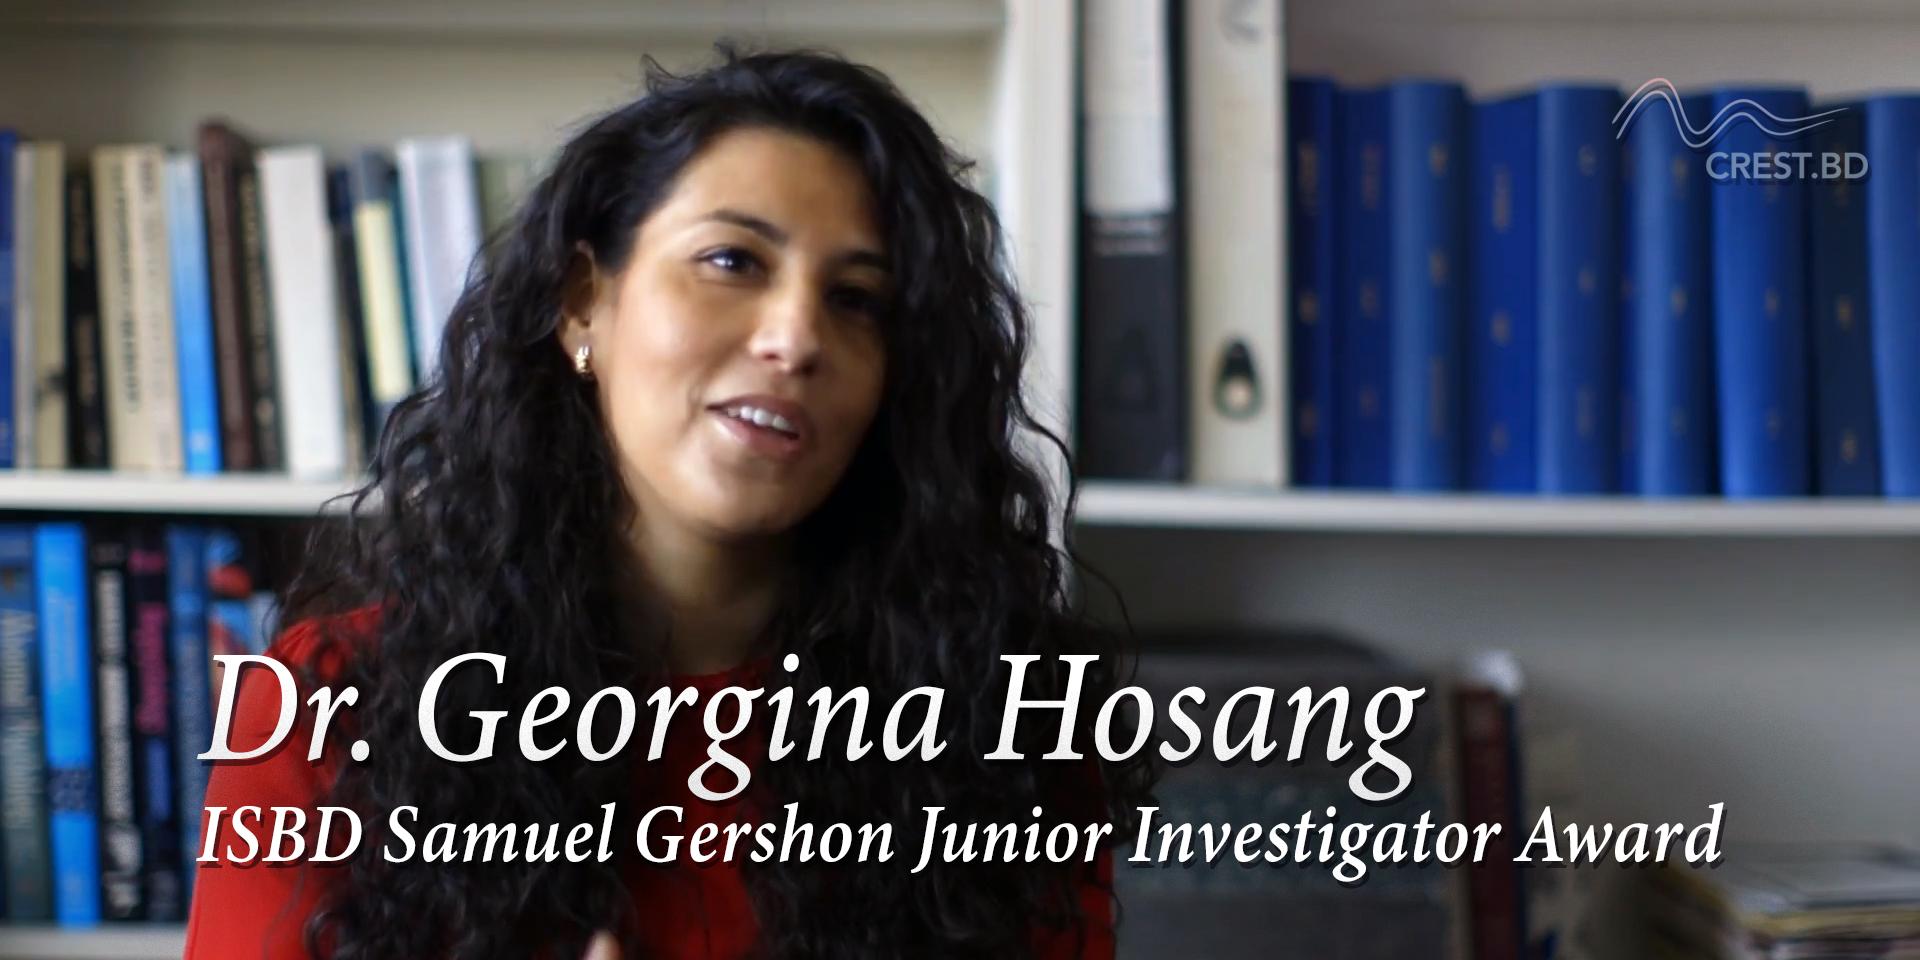 Dr. Georgina Hosang receives Samuel Gershon Junior Investigator Award